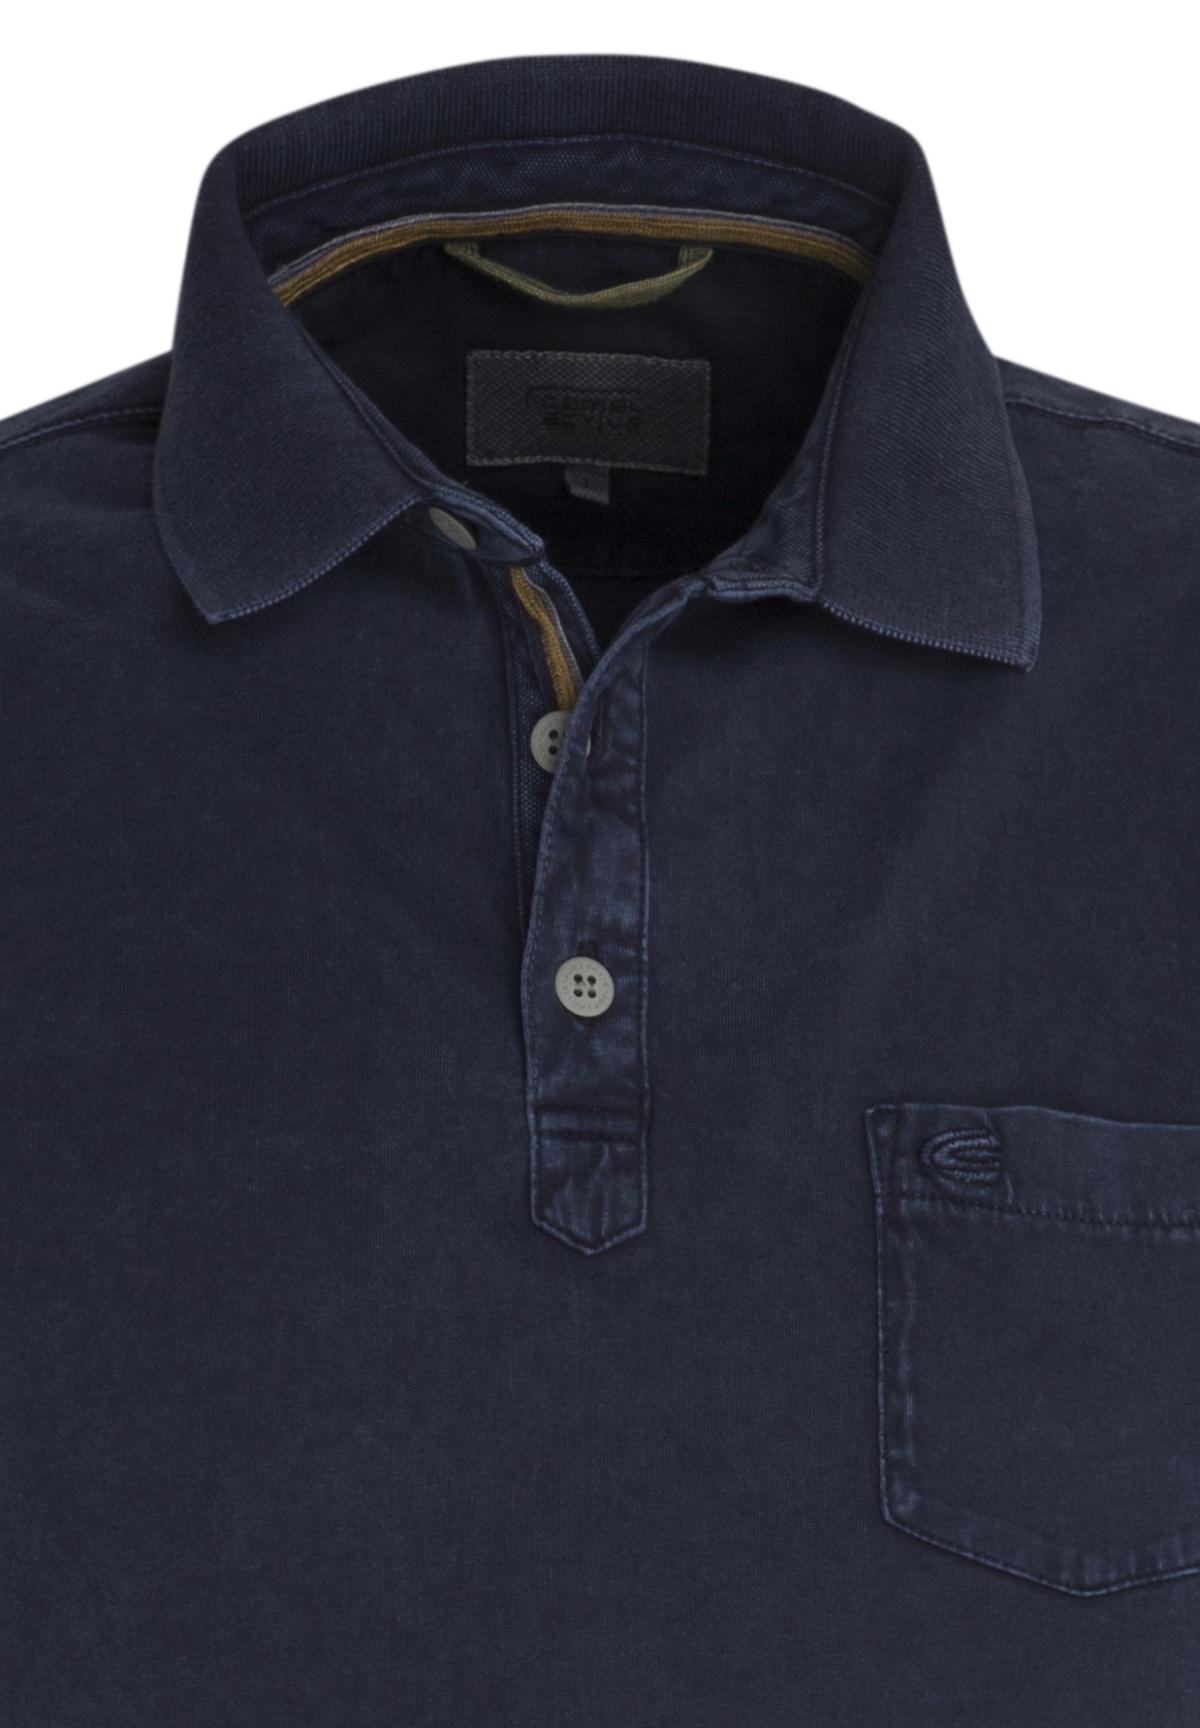 Camel-Active-Herren-Shirt-Poloshirt-Pique-Regular-Fit-NEU Indexbild 35